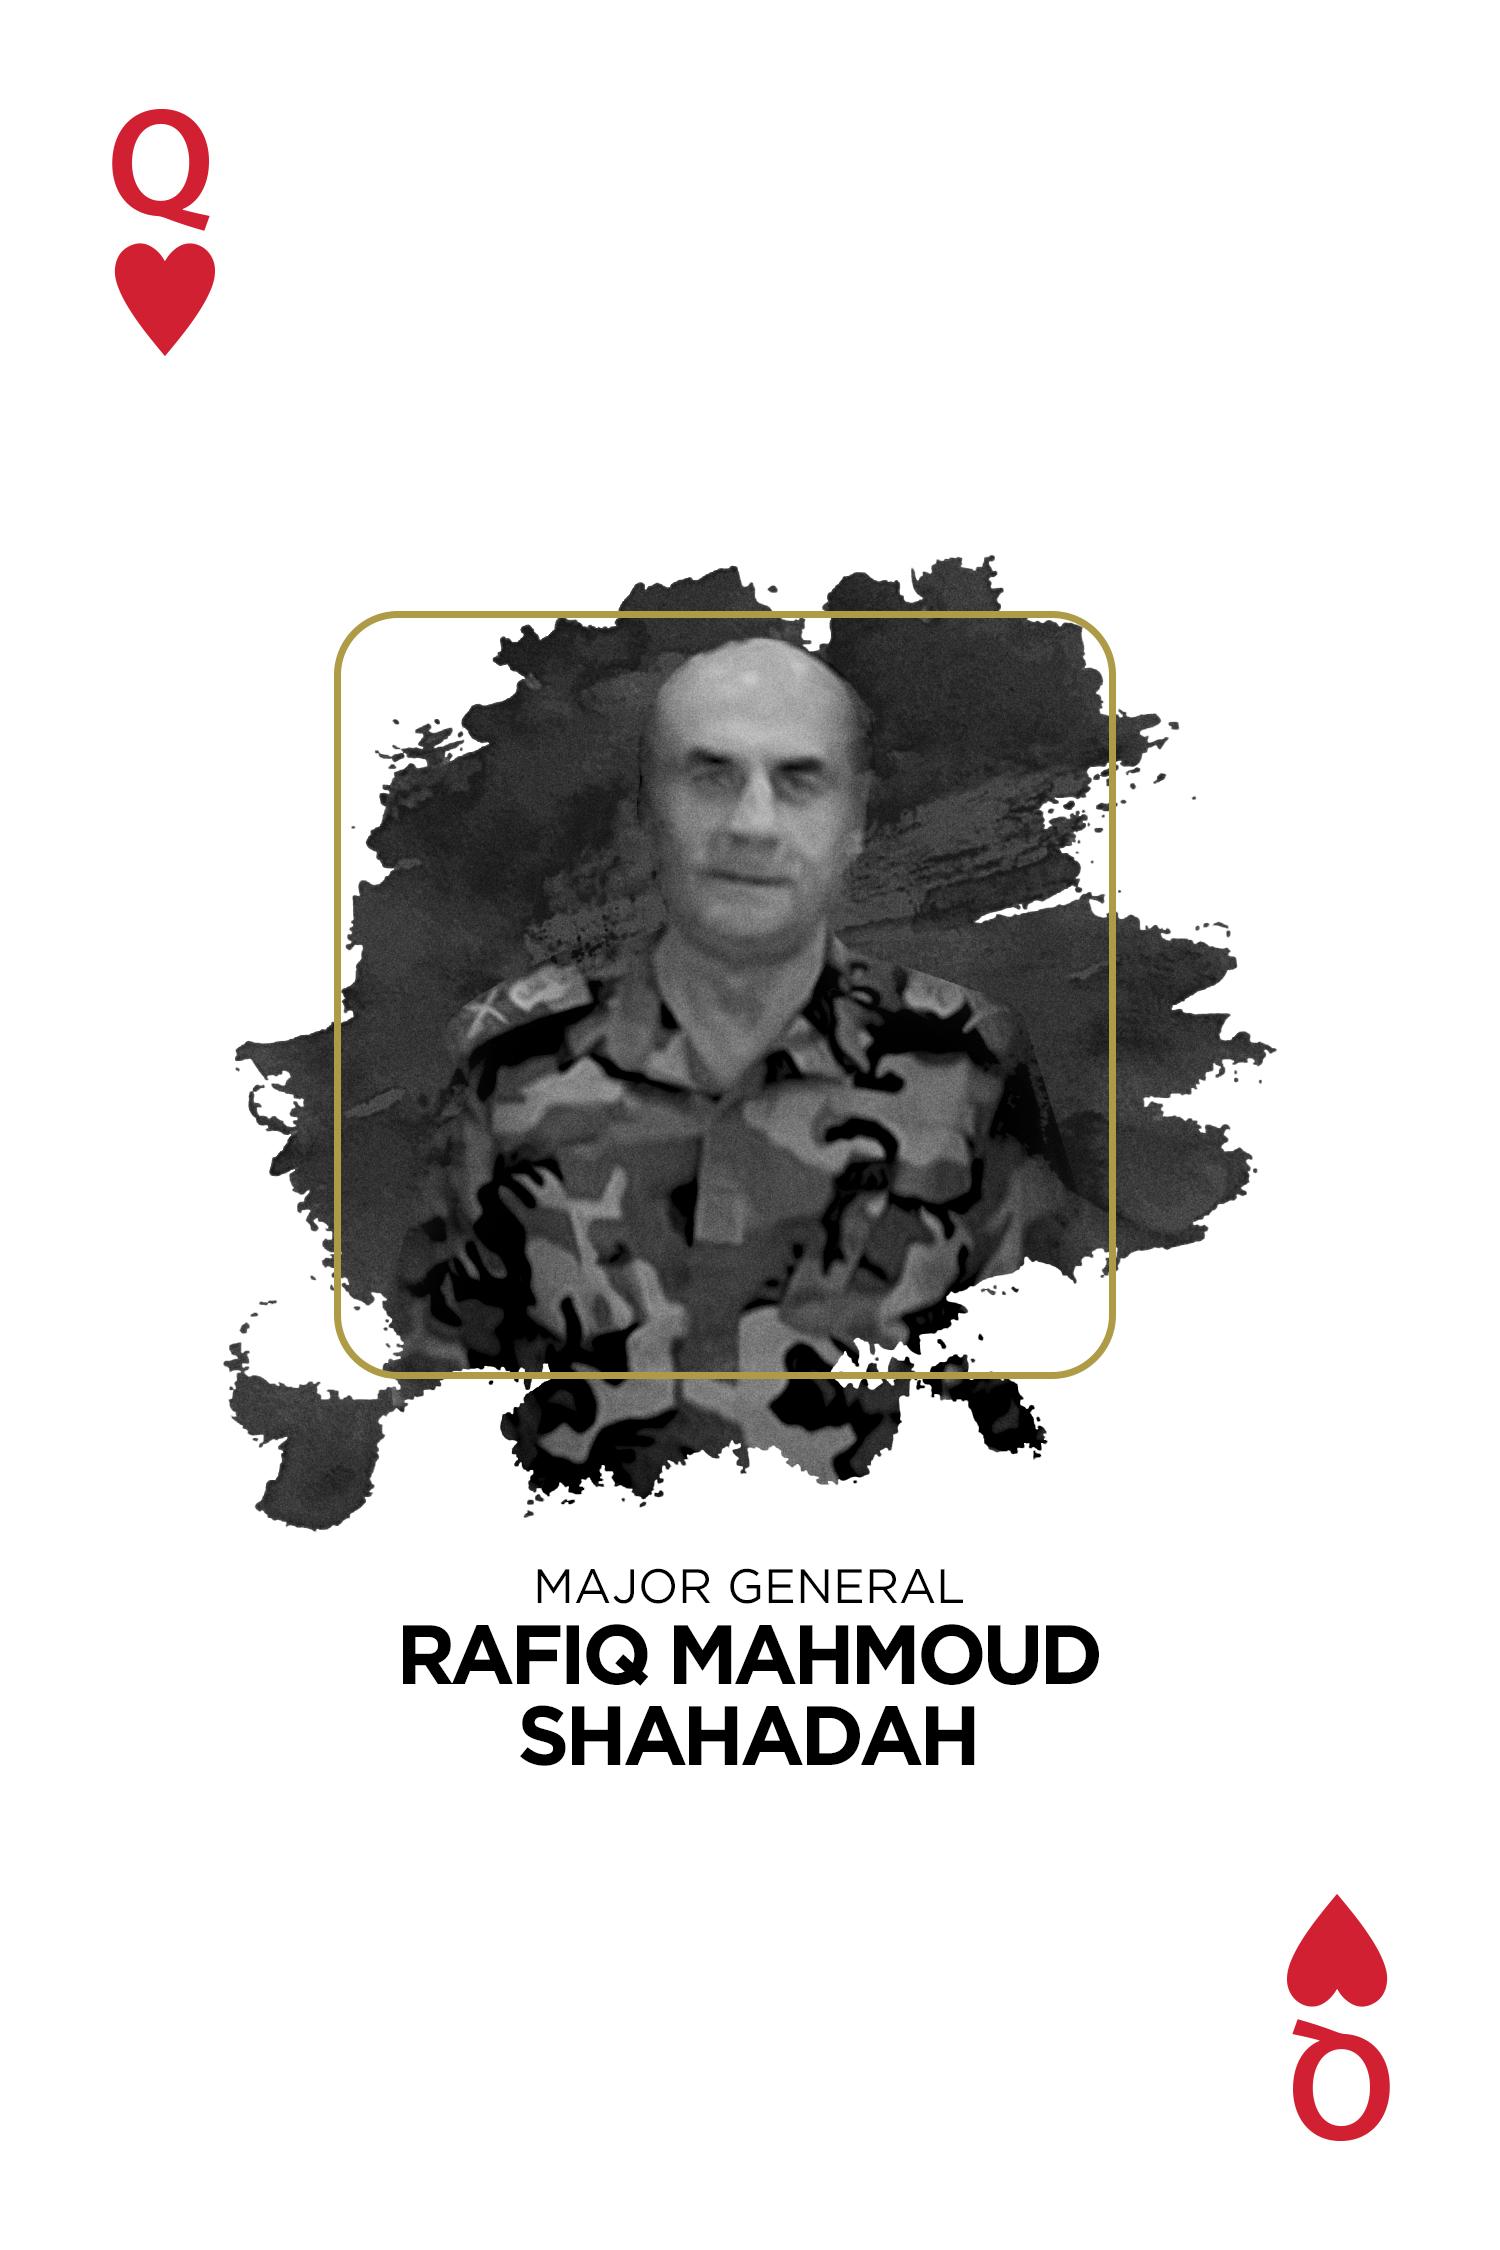 Pro Justice - Rafiq Mahmoud Shahadah